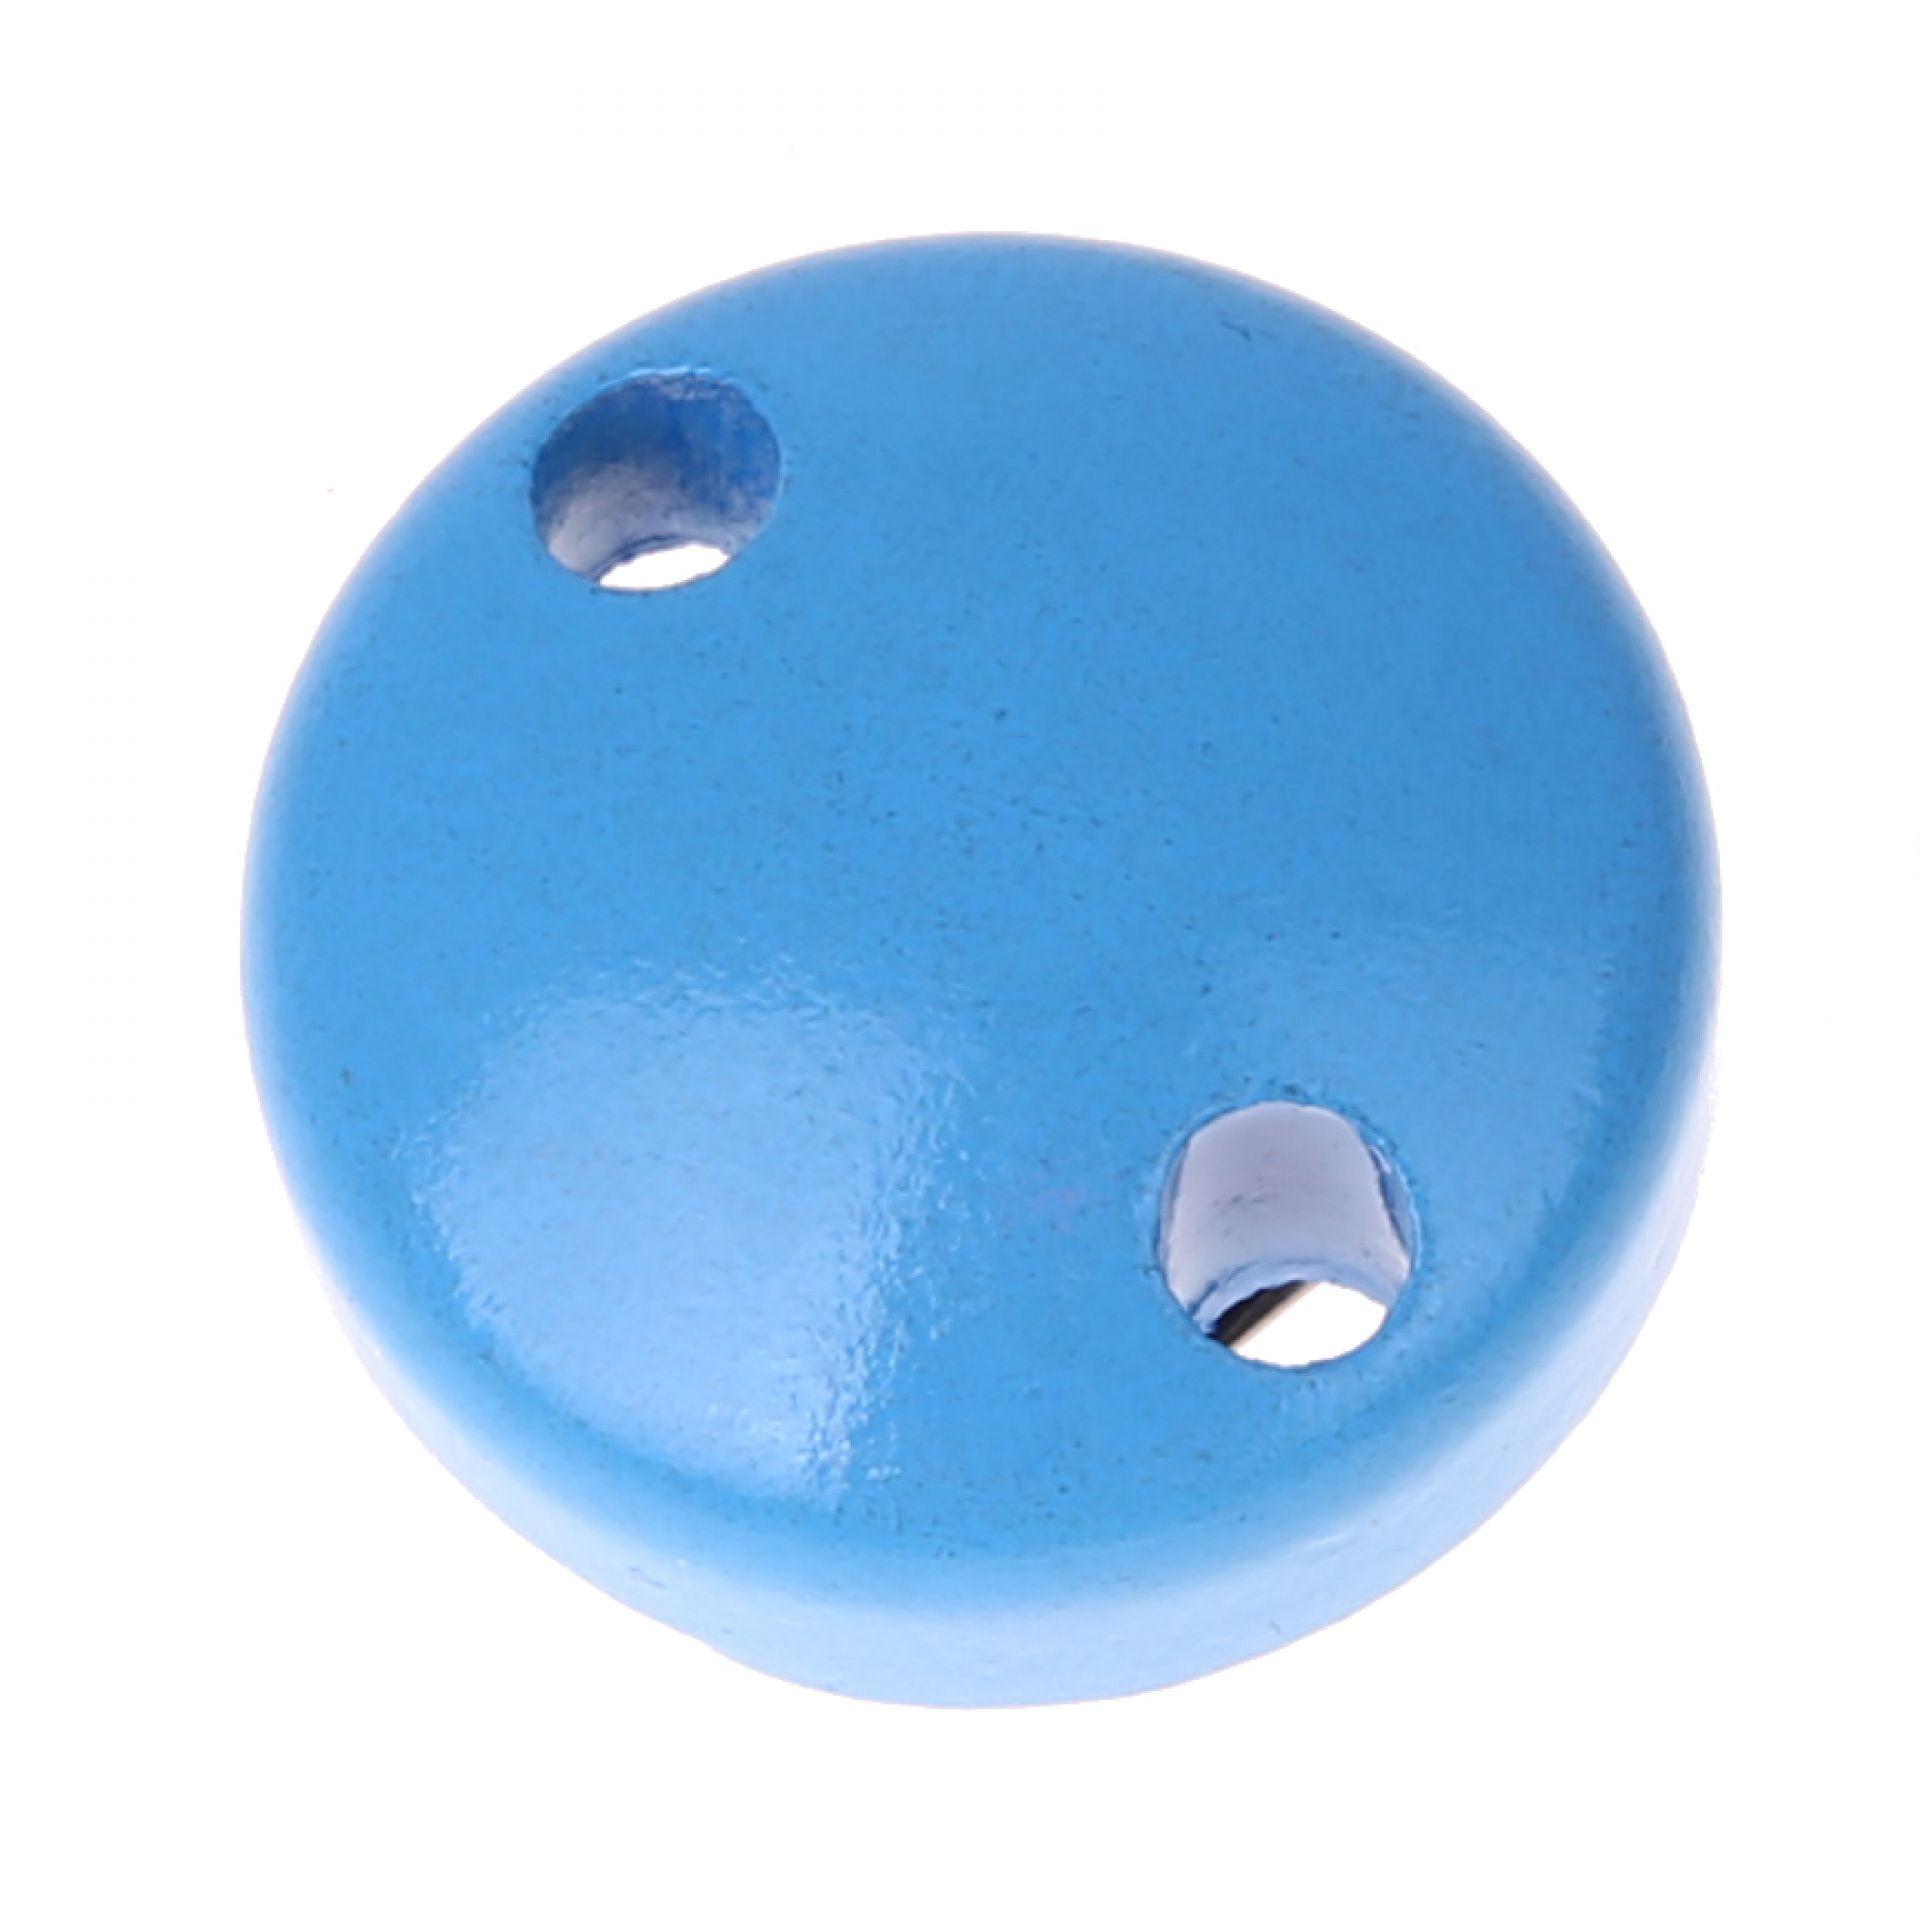 Schnullerclip mini / Holzclip Ø30mm 'skyblau' 425 auf Lager